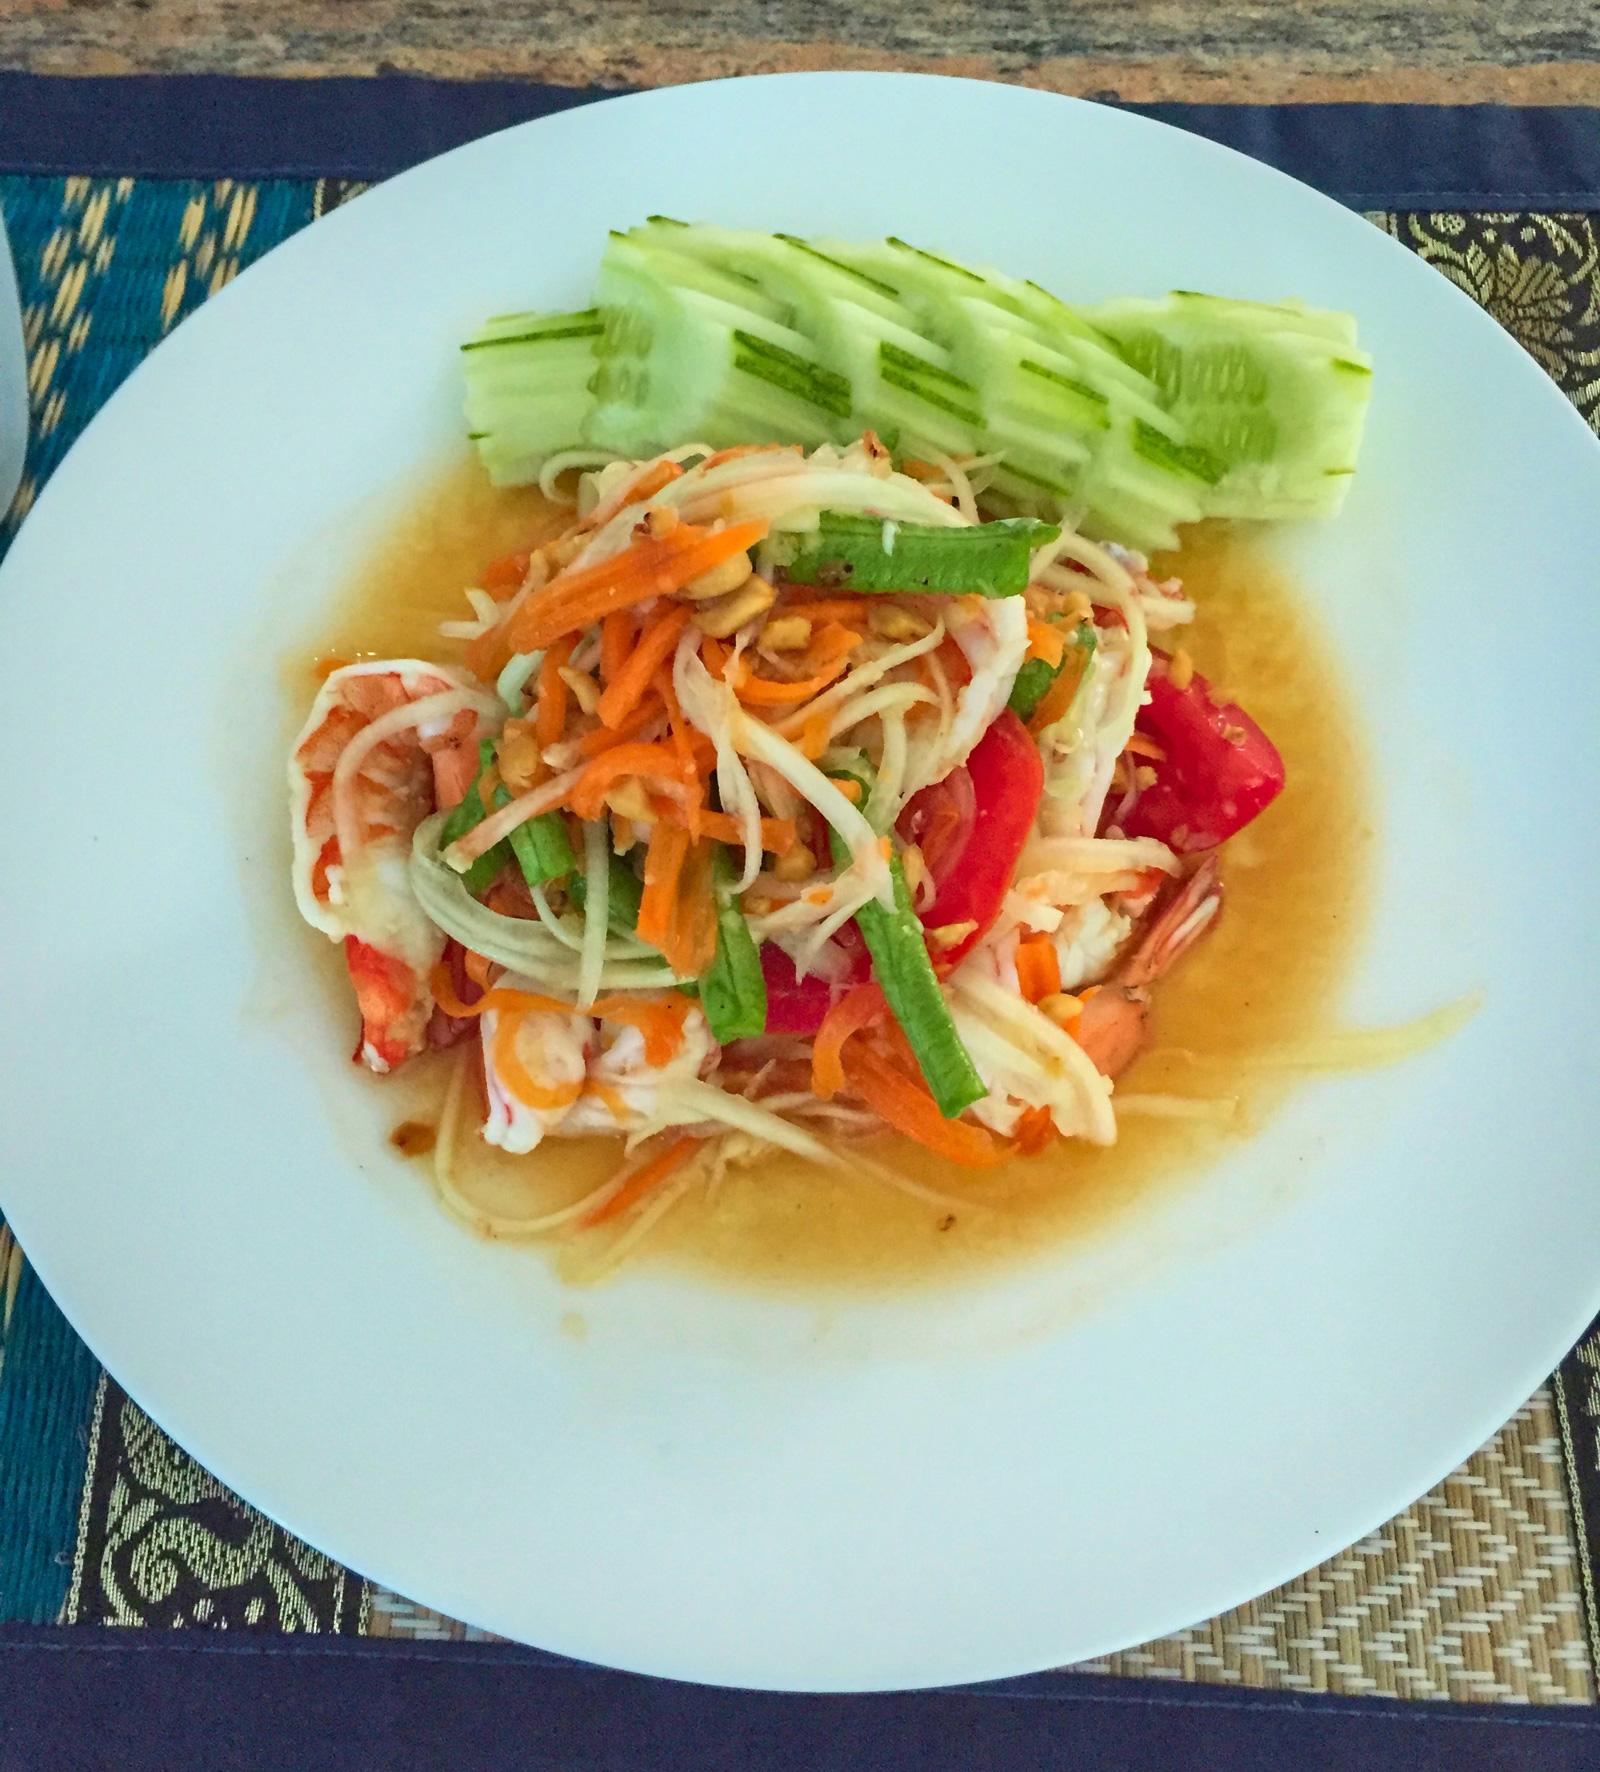 Thai Papaya salad with shrimps